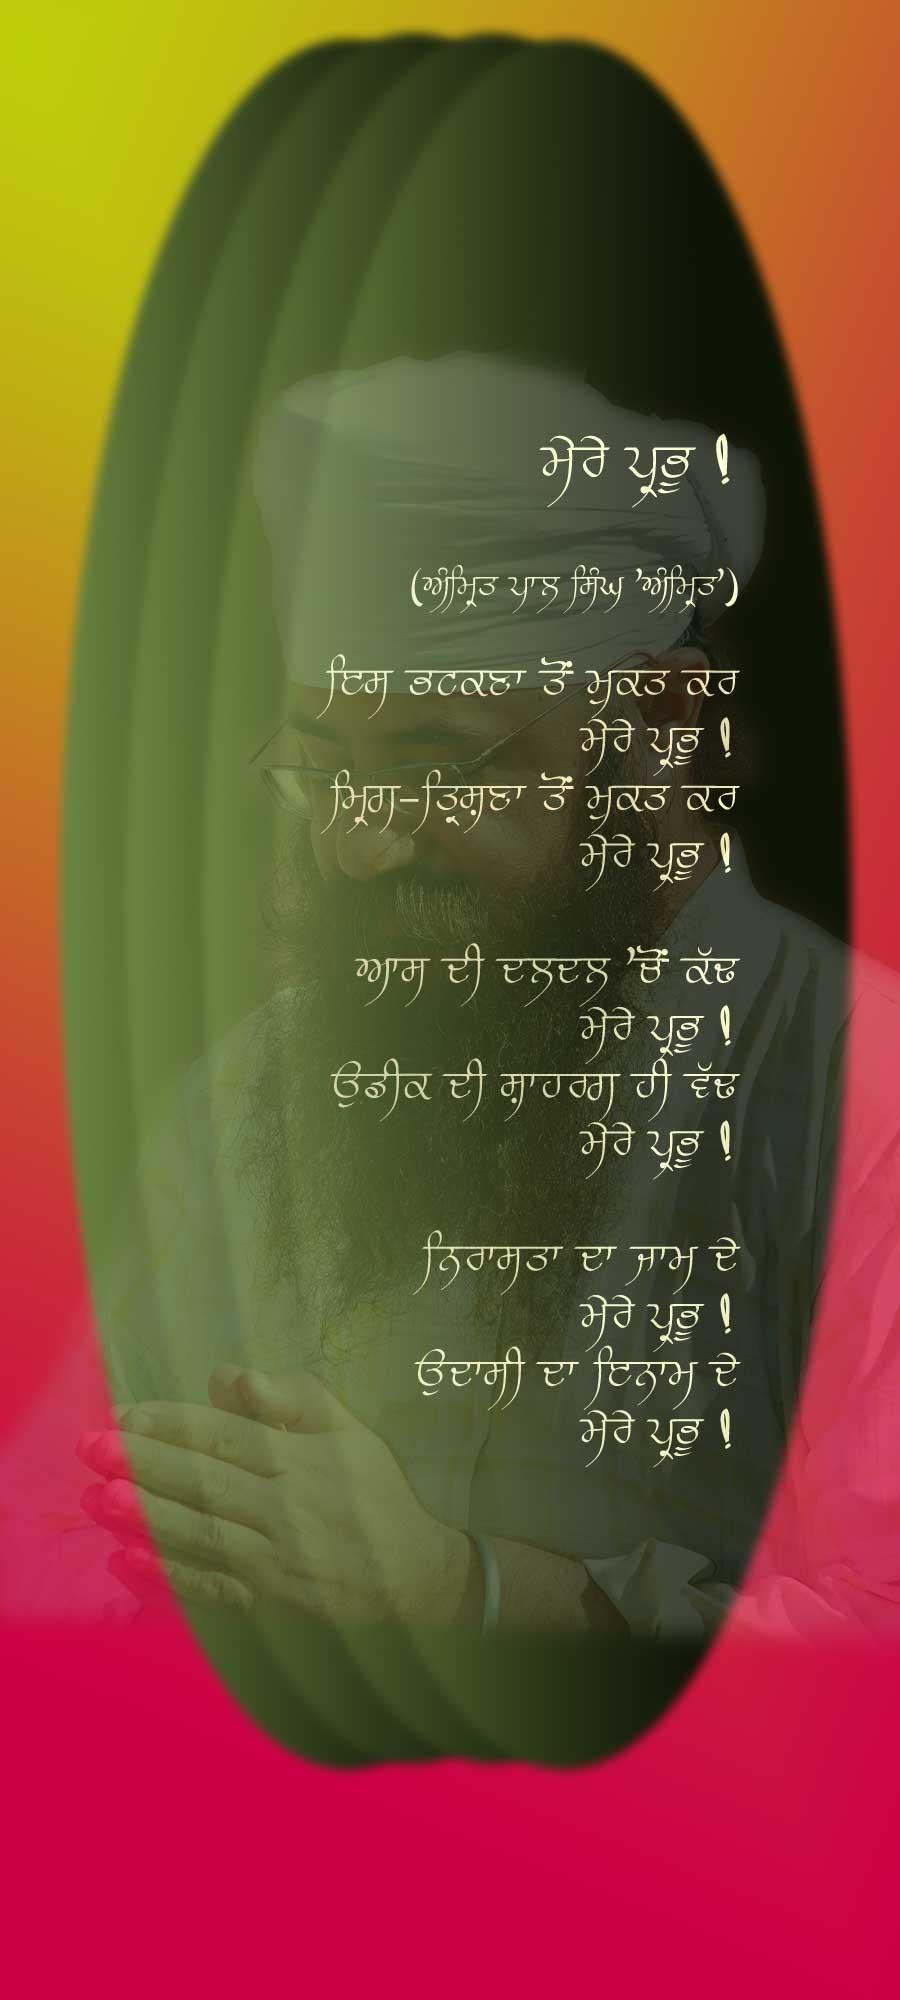 Punjabi Poem 'Mere Prabhu' by Amrit Pal Singh 'Amrit'